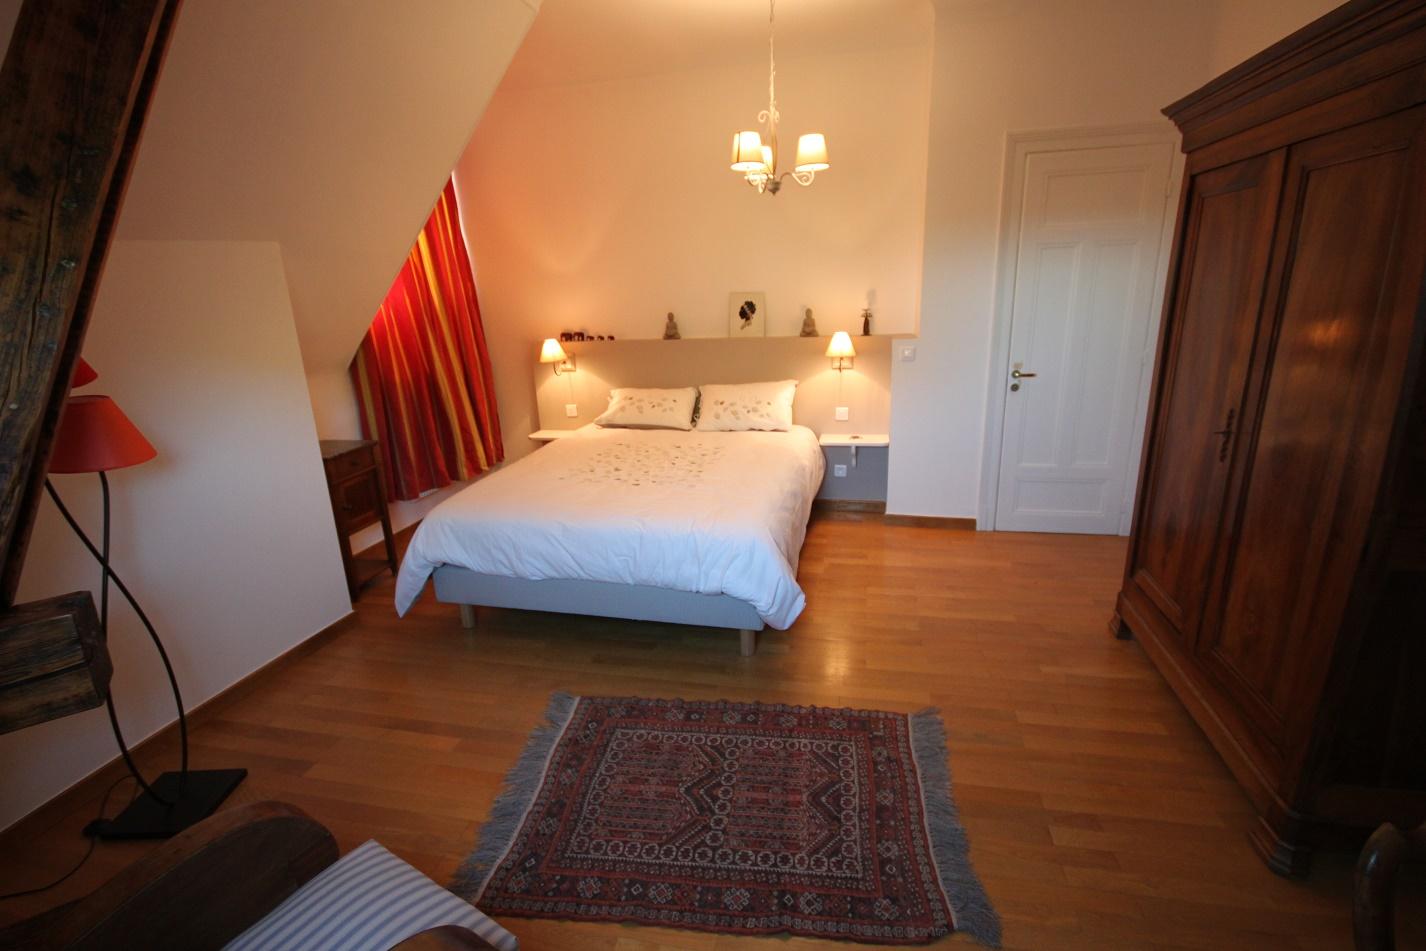 chambre d 39 h tes de madame francine bockel chambre capucine hautes vosges d 39 alsace. Black Bedroom Furniture Sets. Home Design Ideas